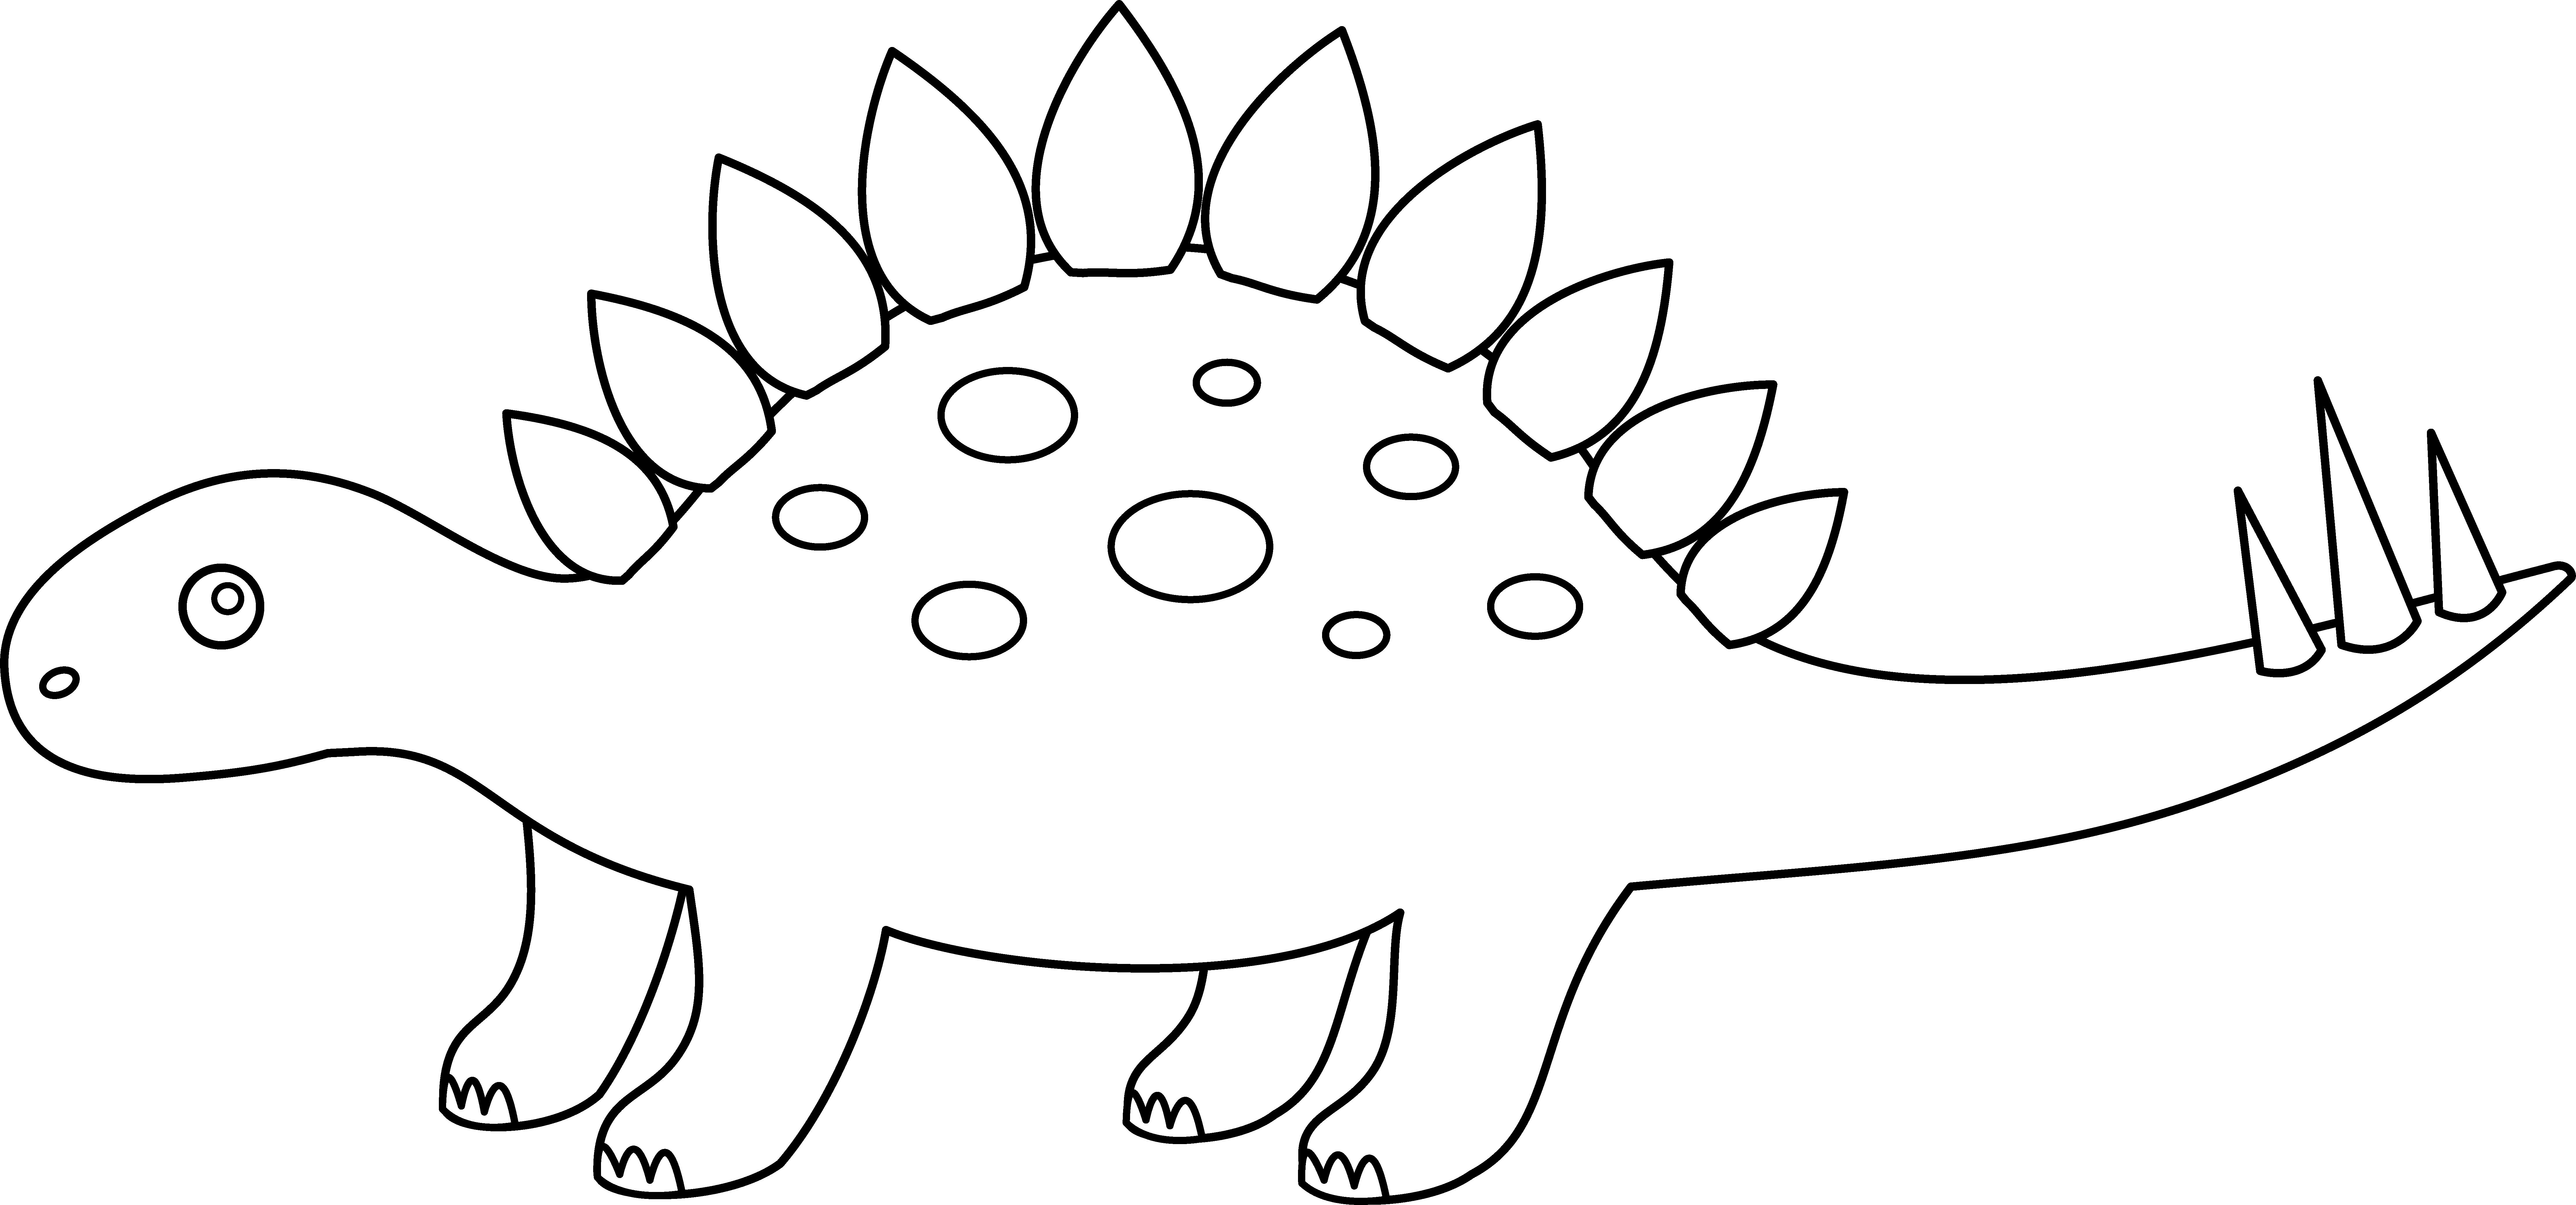 stegosaurus printable stegosaurus coloring page free printable coloring pages printable stegosaurus